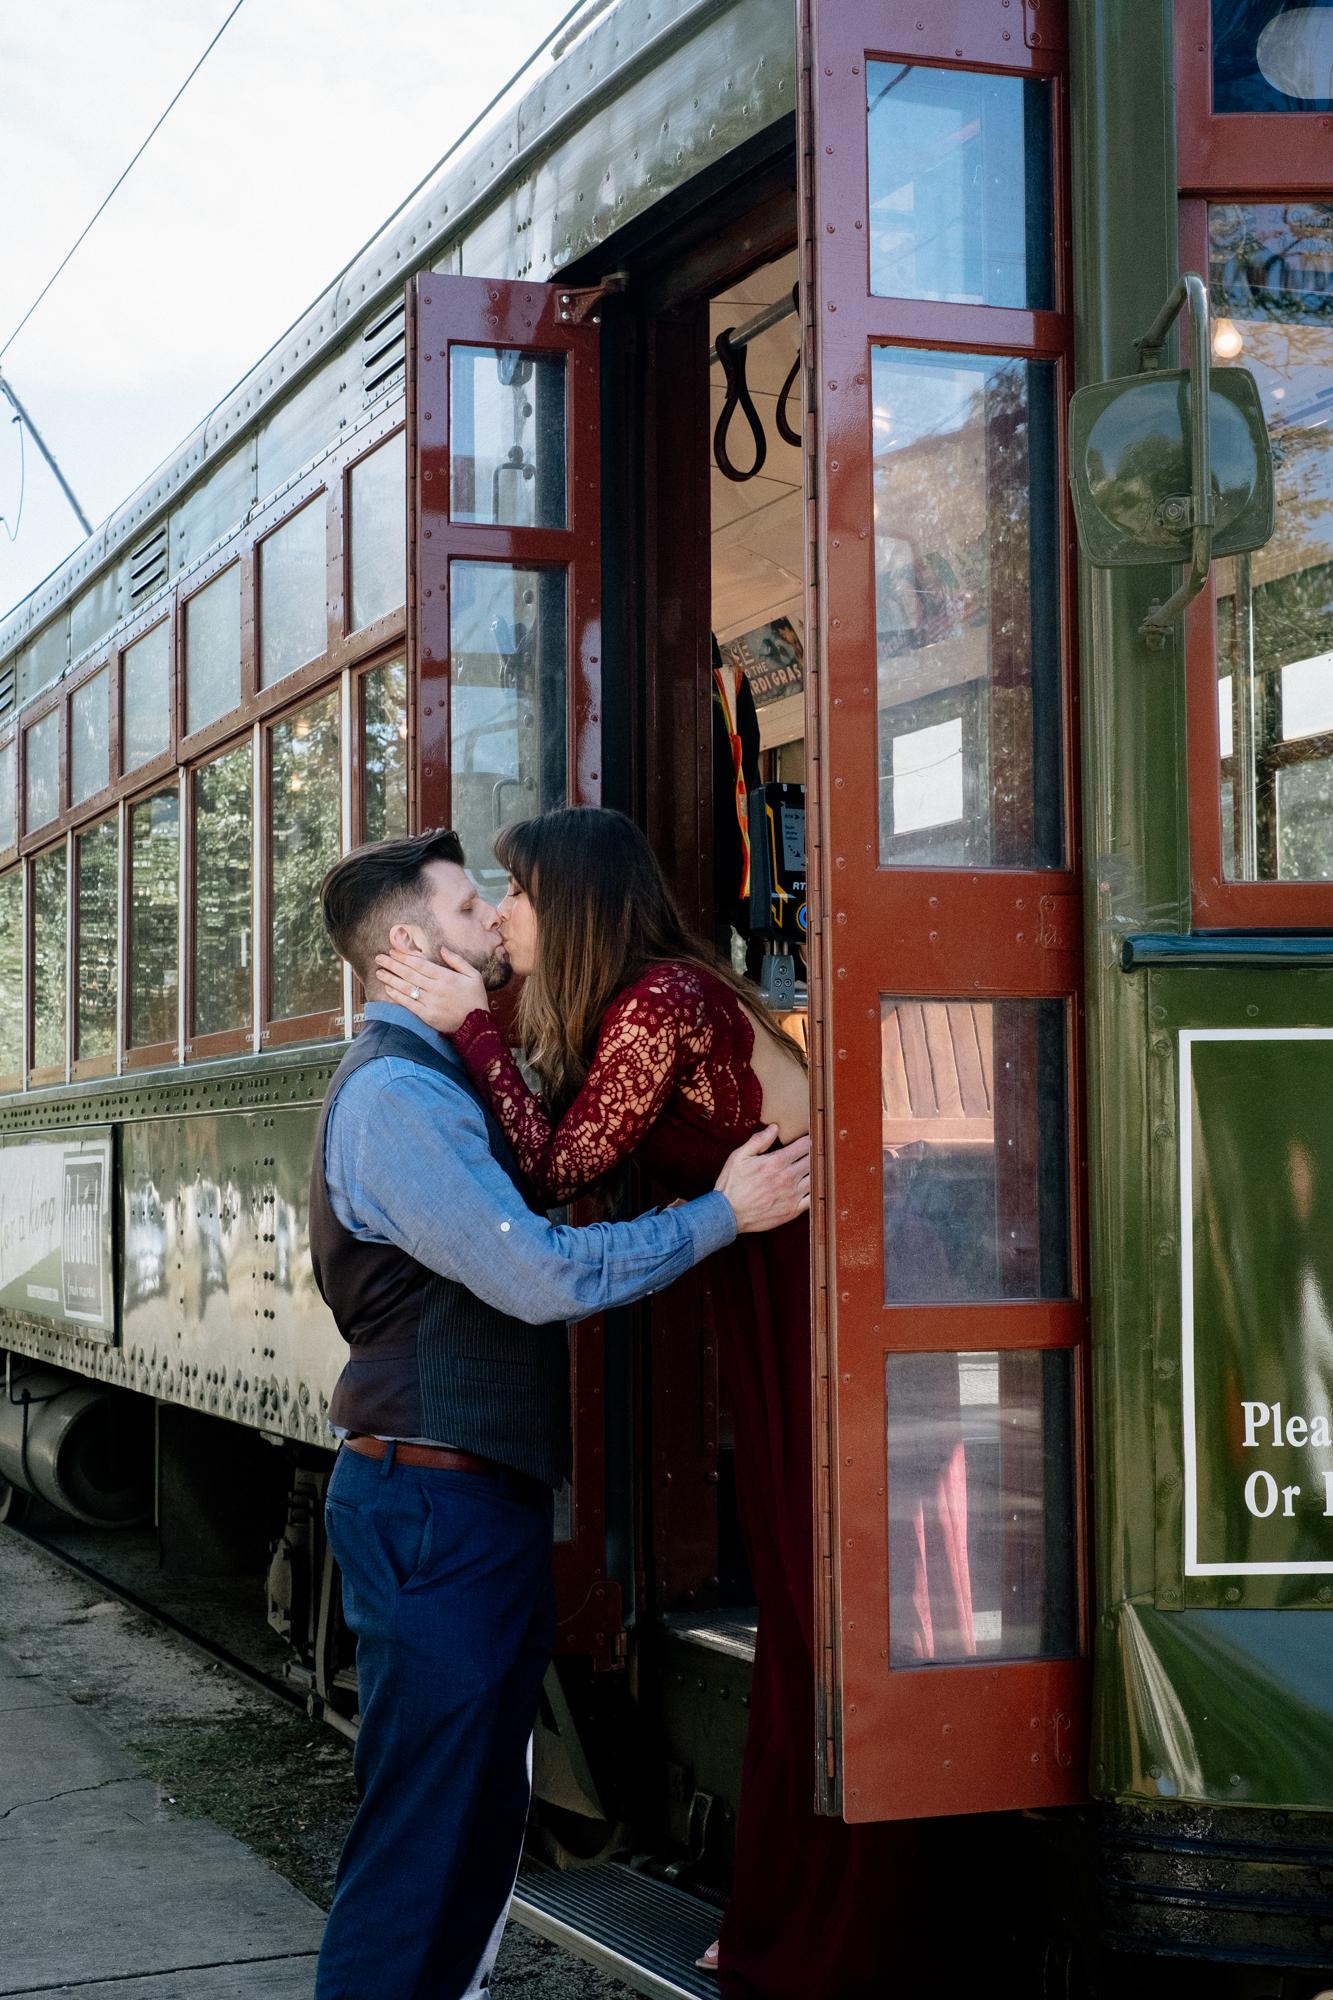 Jen_Montgomery_Photography_Angela_Brian_Engagement_Proposal_FB-134.jpg